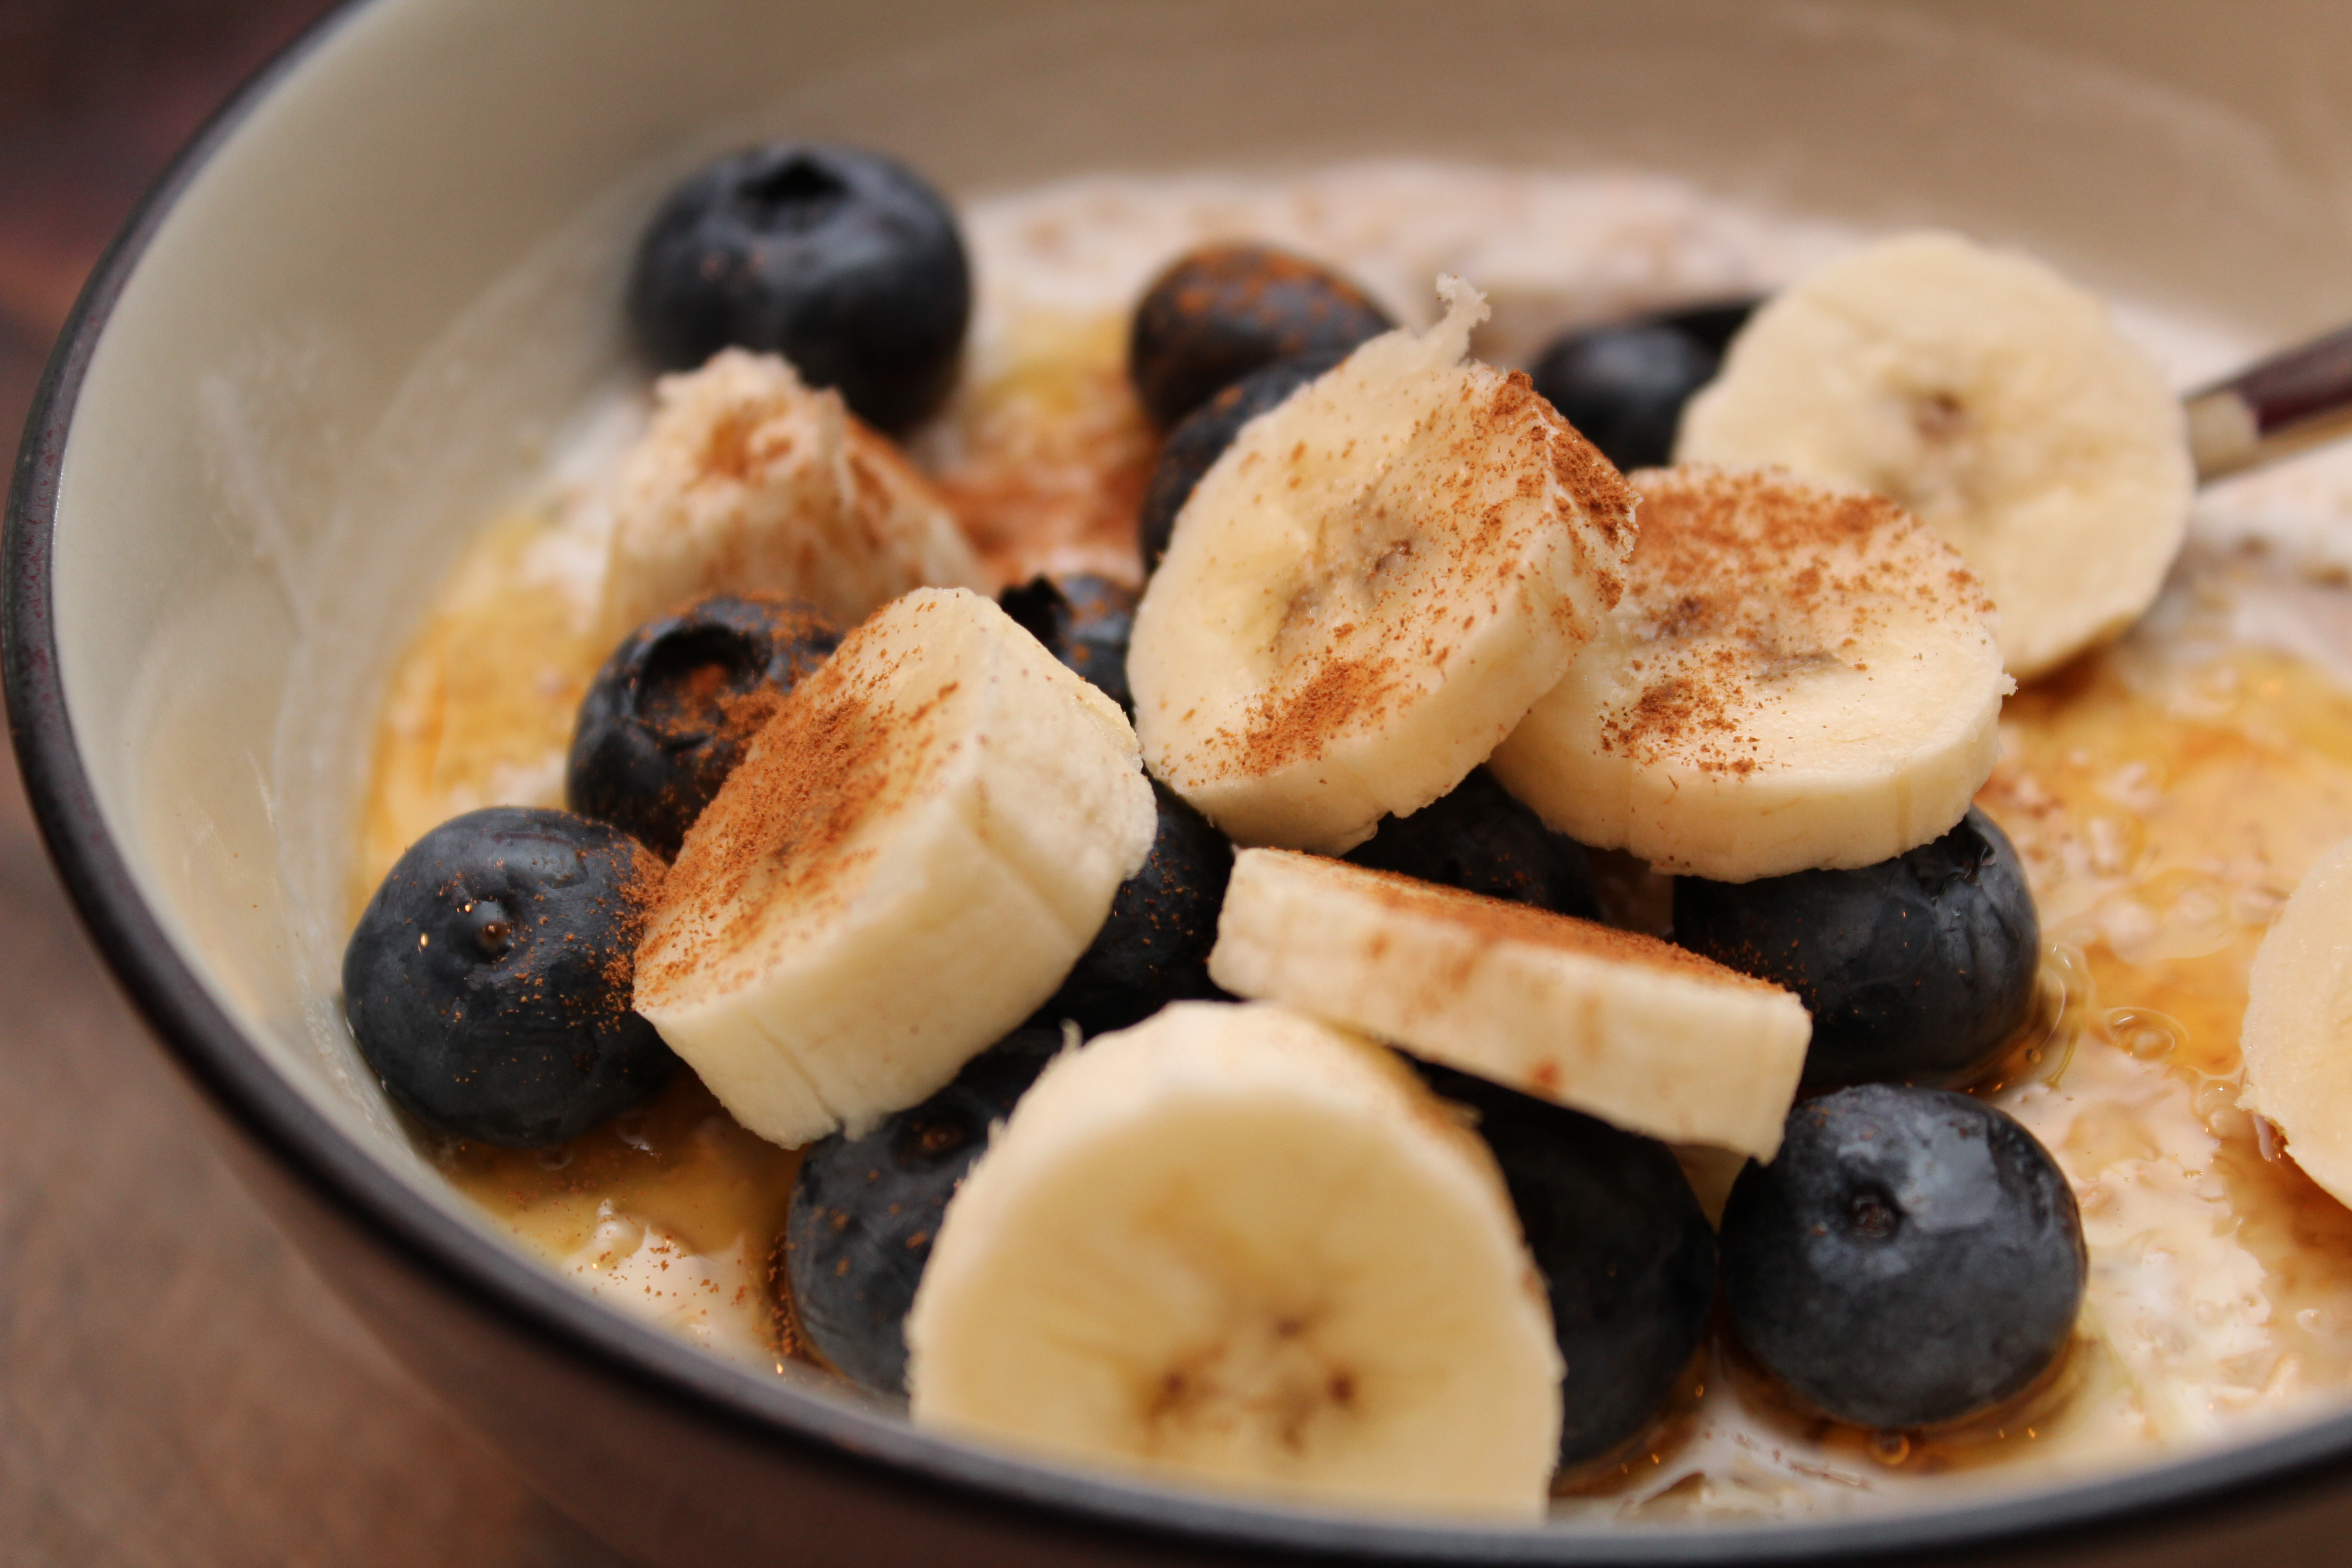 Tomorroats: A Quick, Simple & Healthy Breakfast « Sarah's